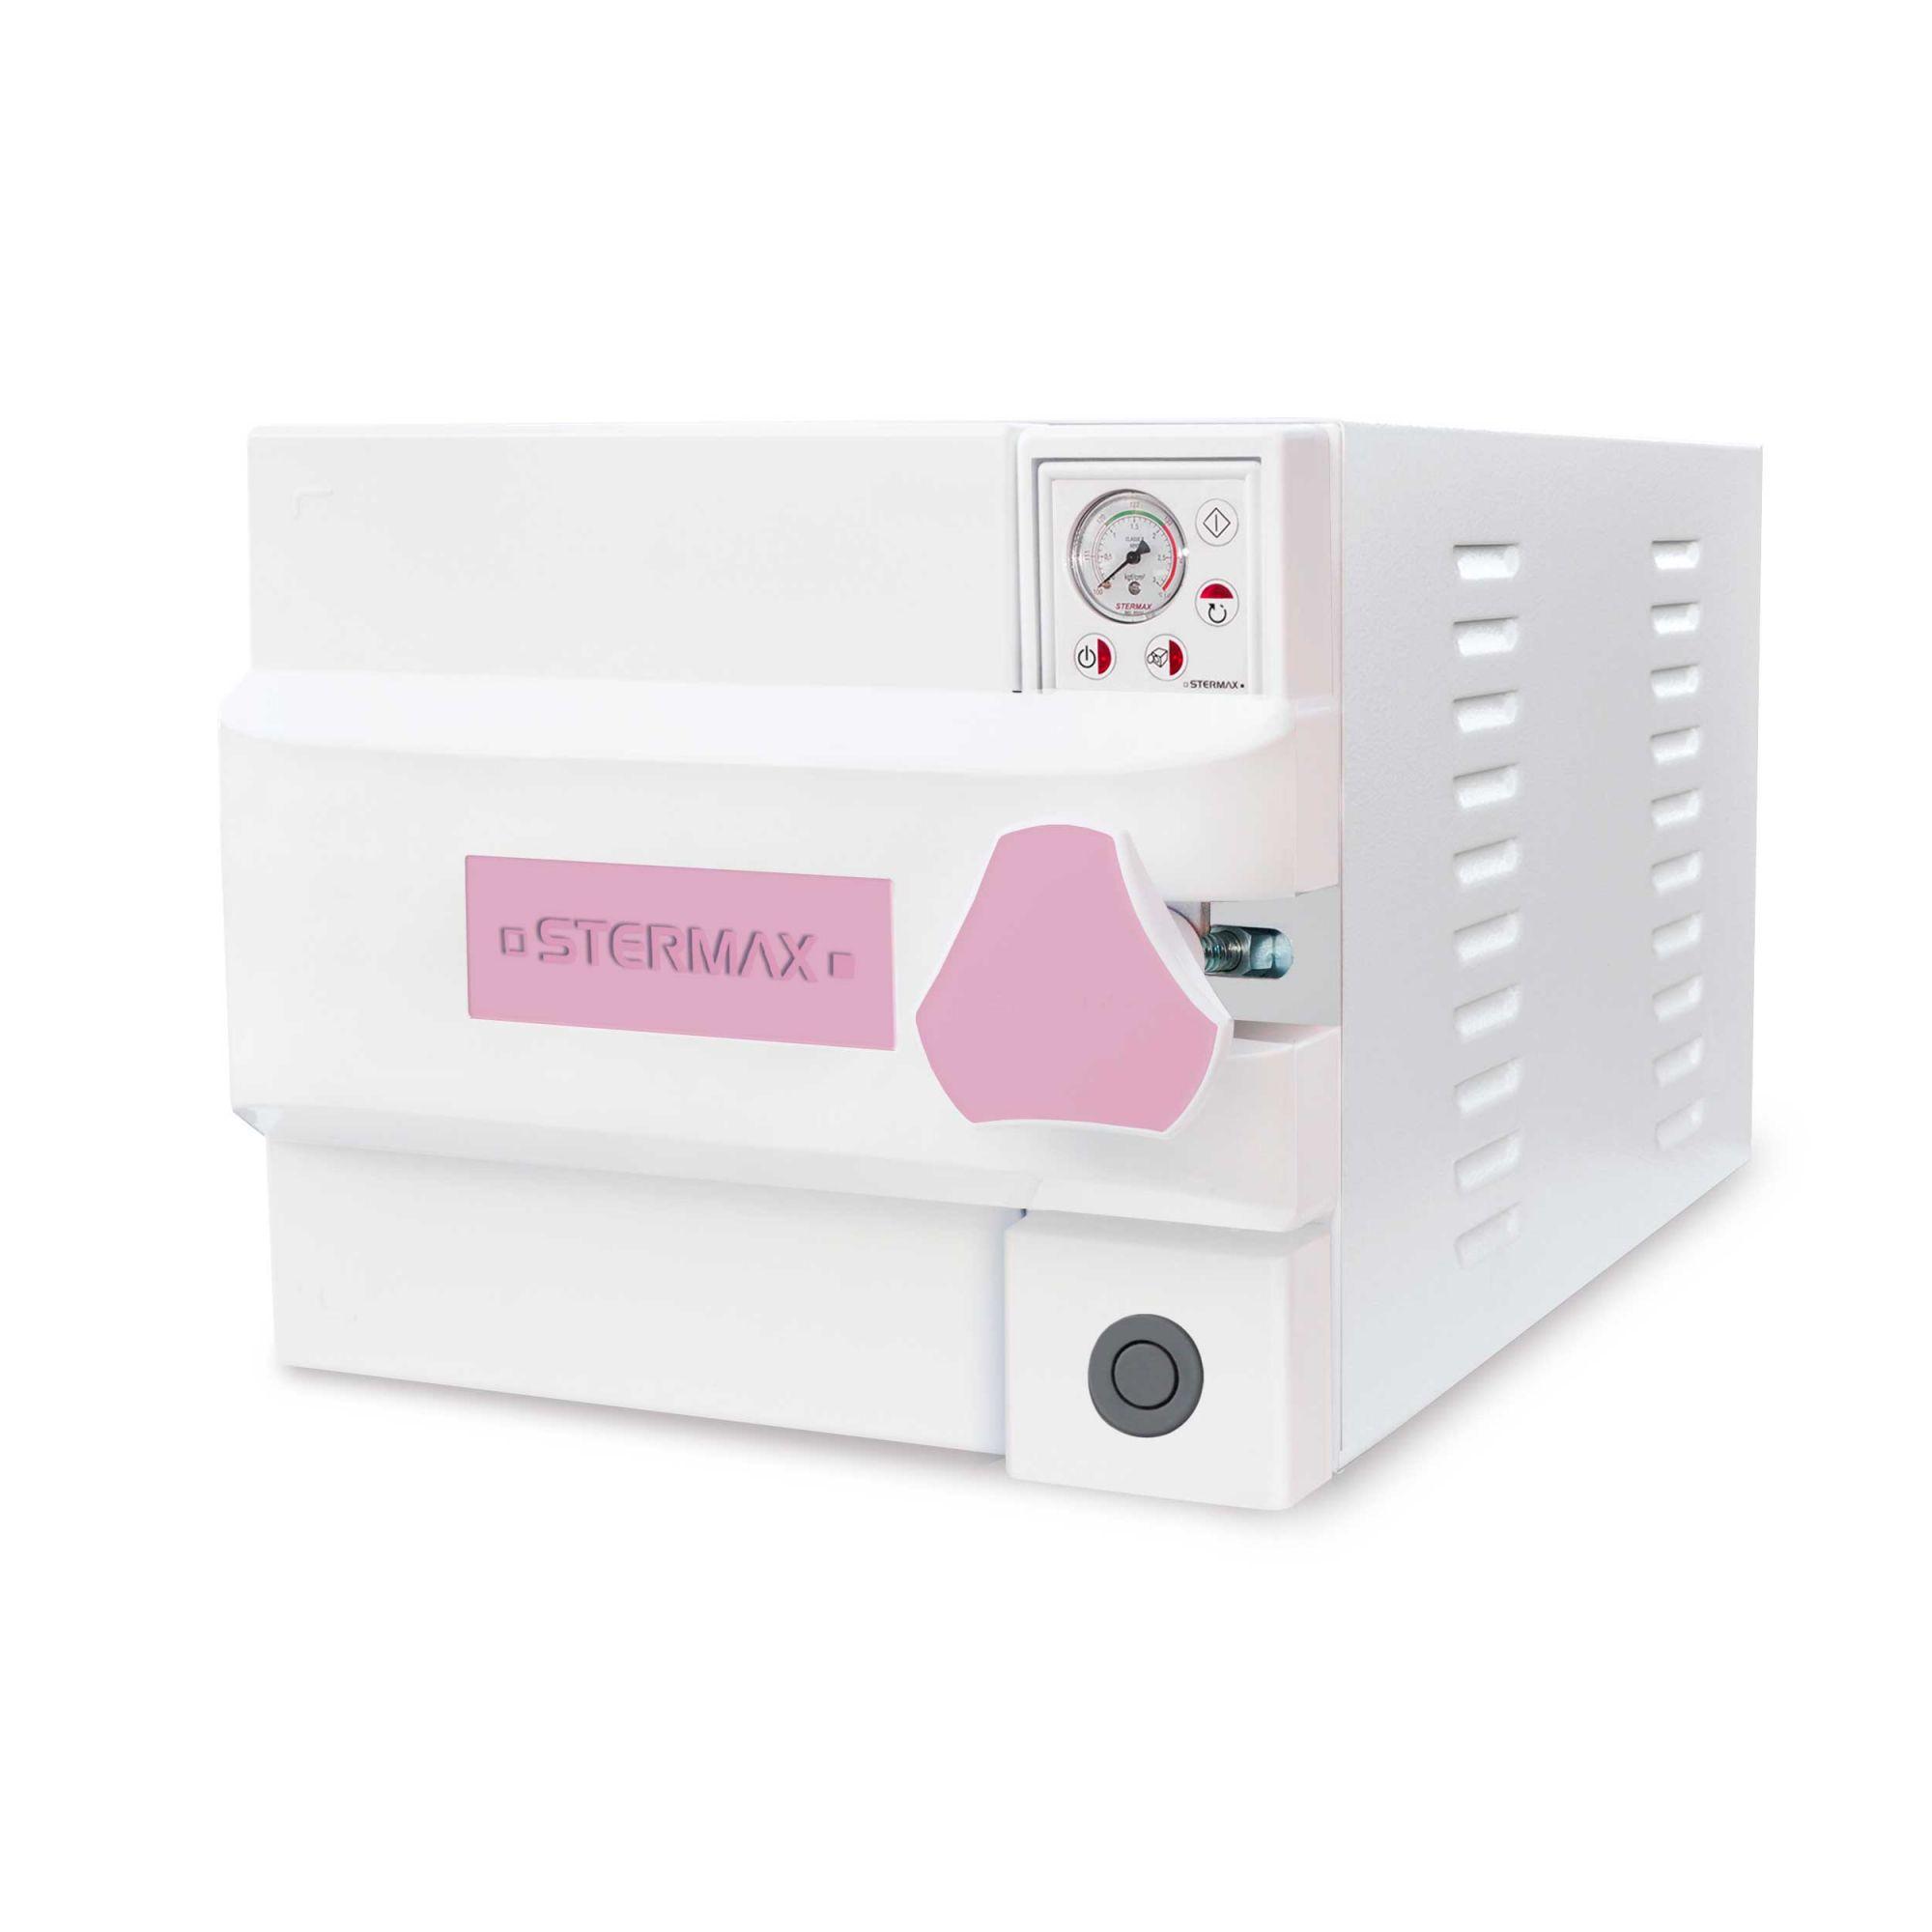 Autoclave Horizontal Analógica Gravitacional Silenciosa Box 21 Litros – Mod. 21AHAGSB - Stermax